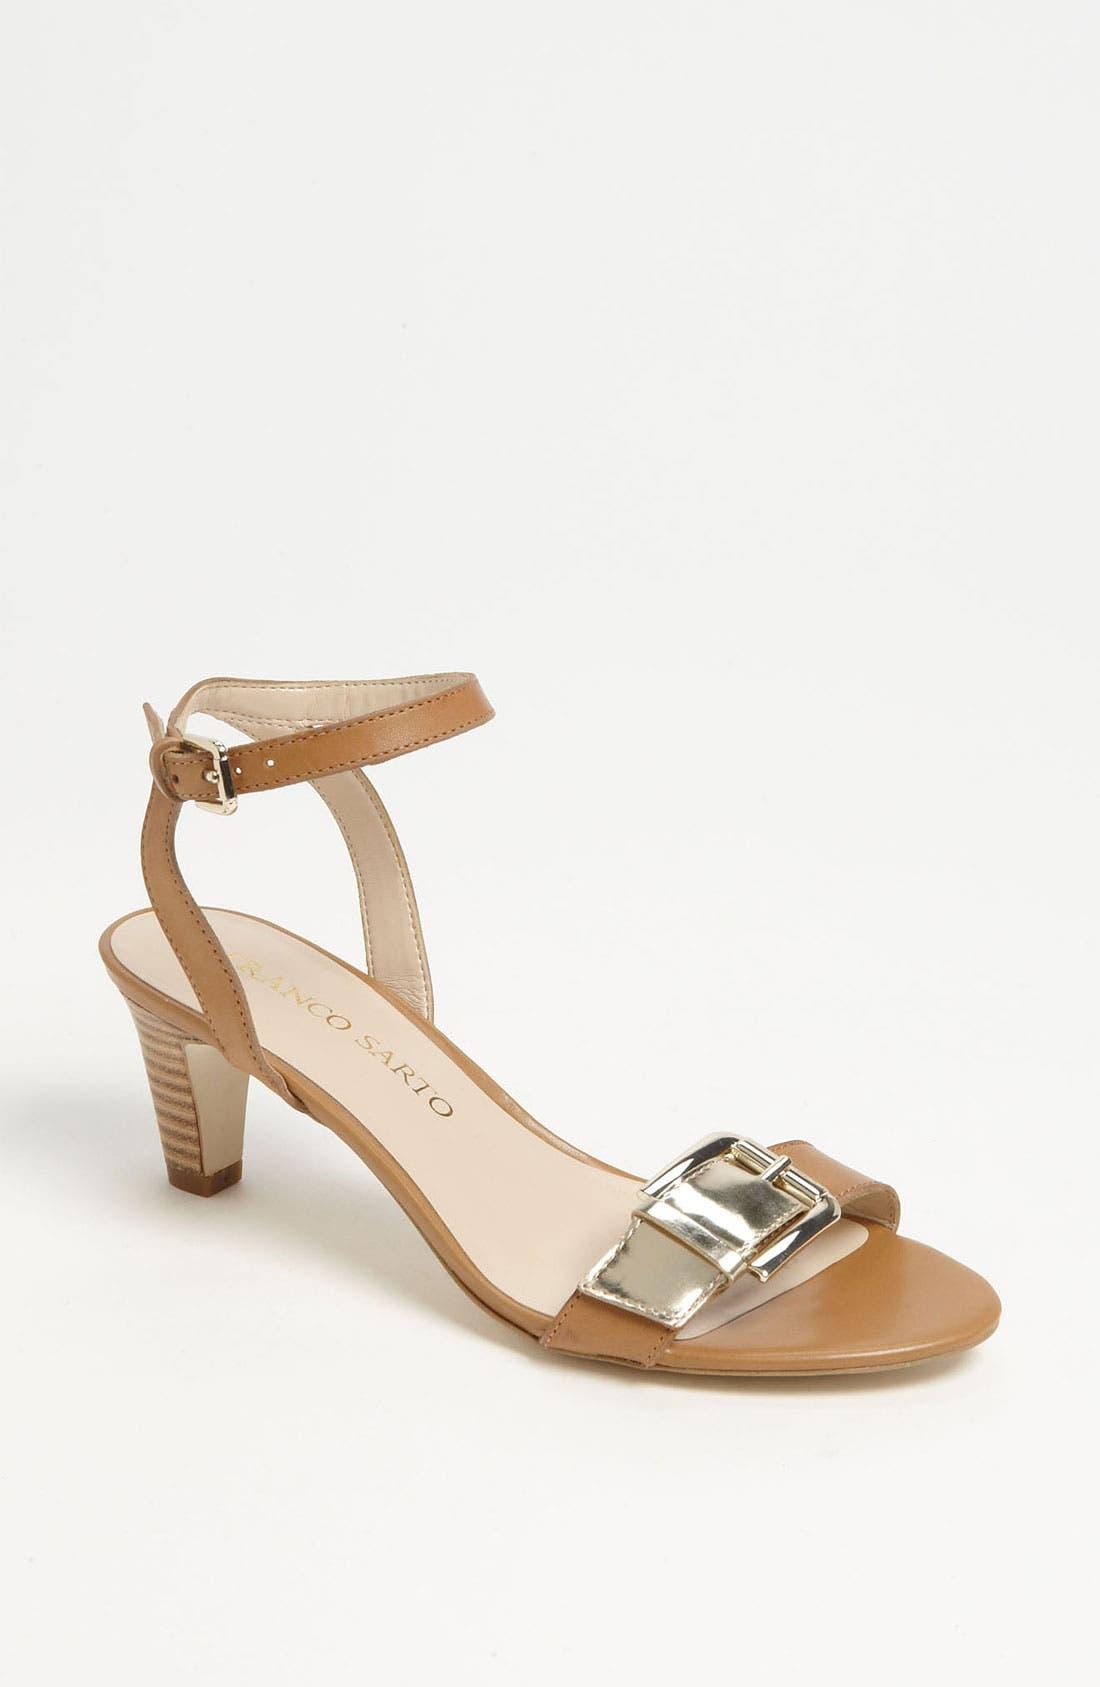 Main Image - Franco Sarto 'Tarry' Sandal